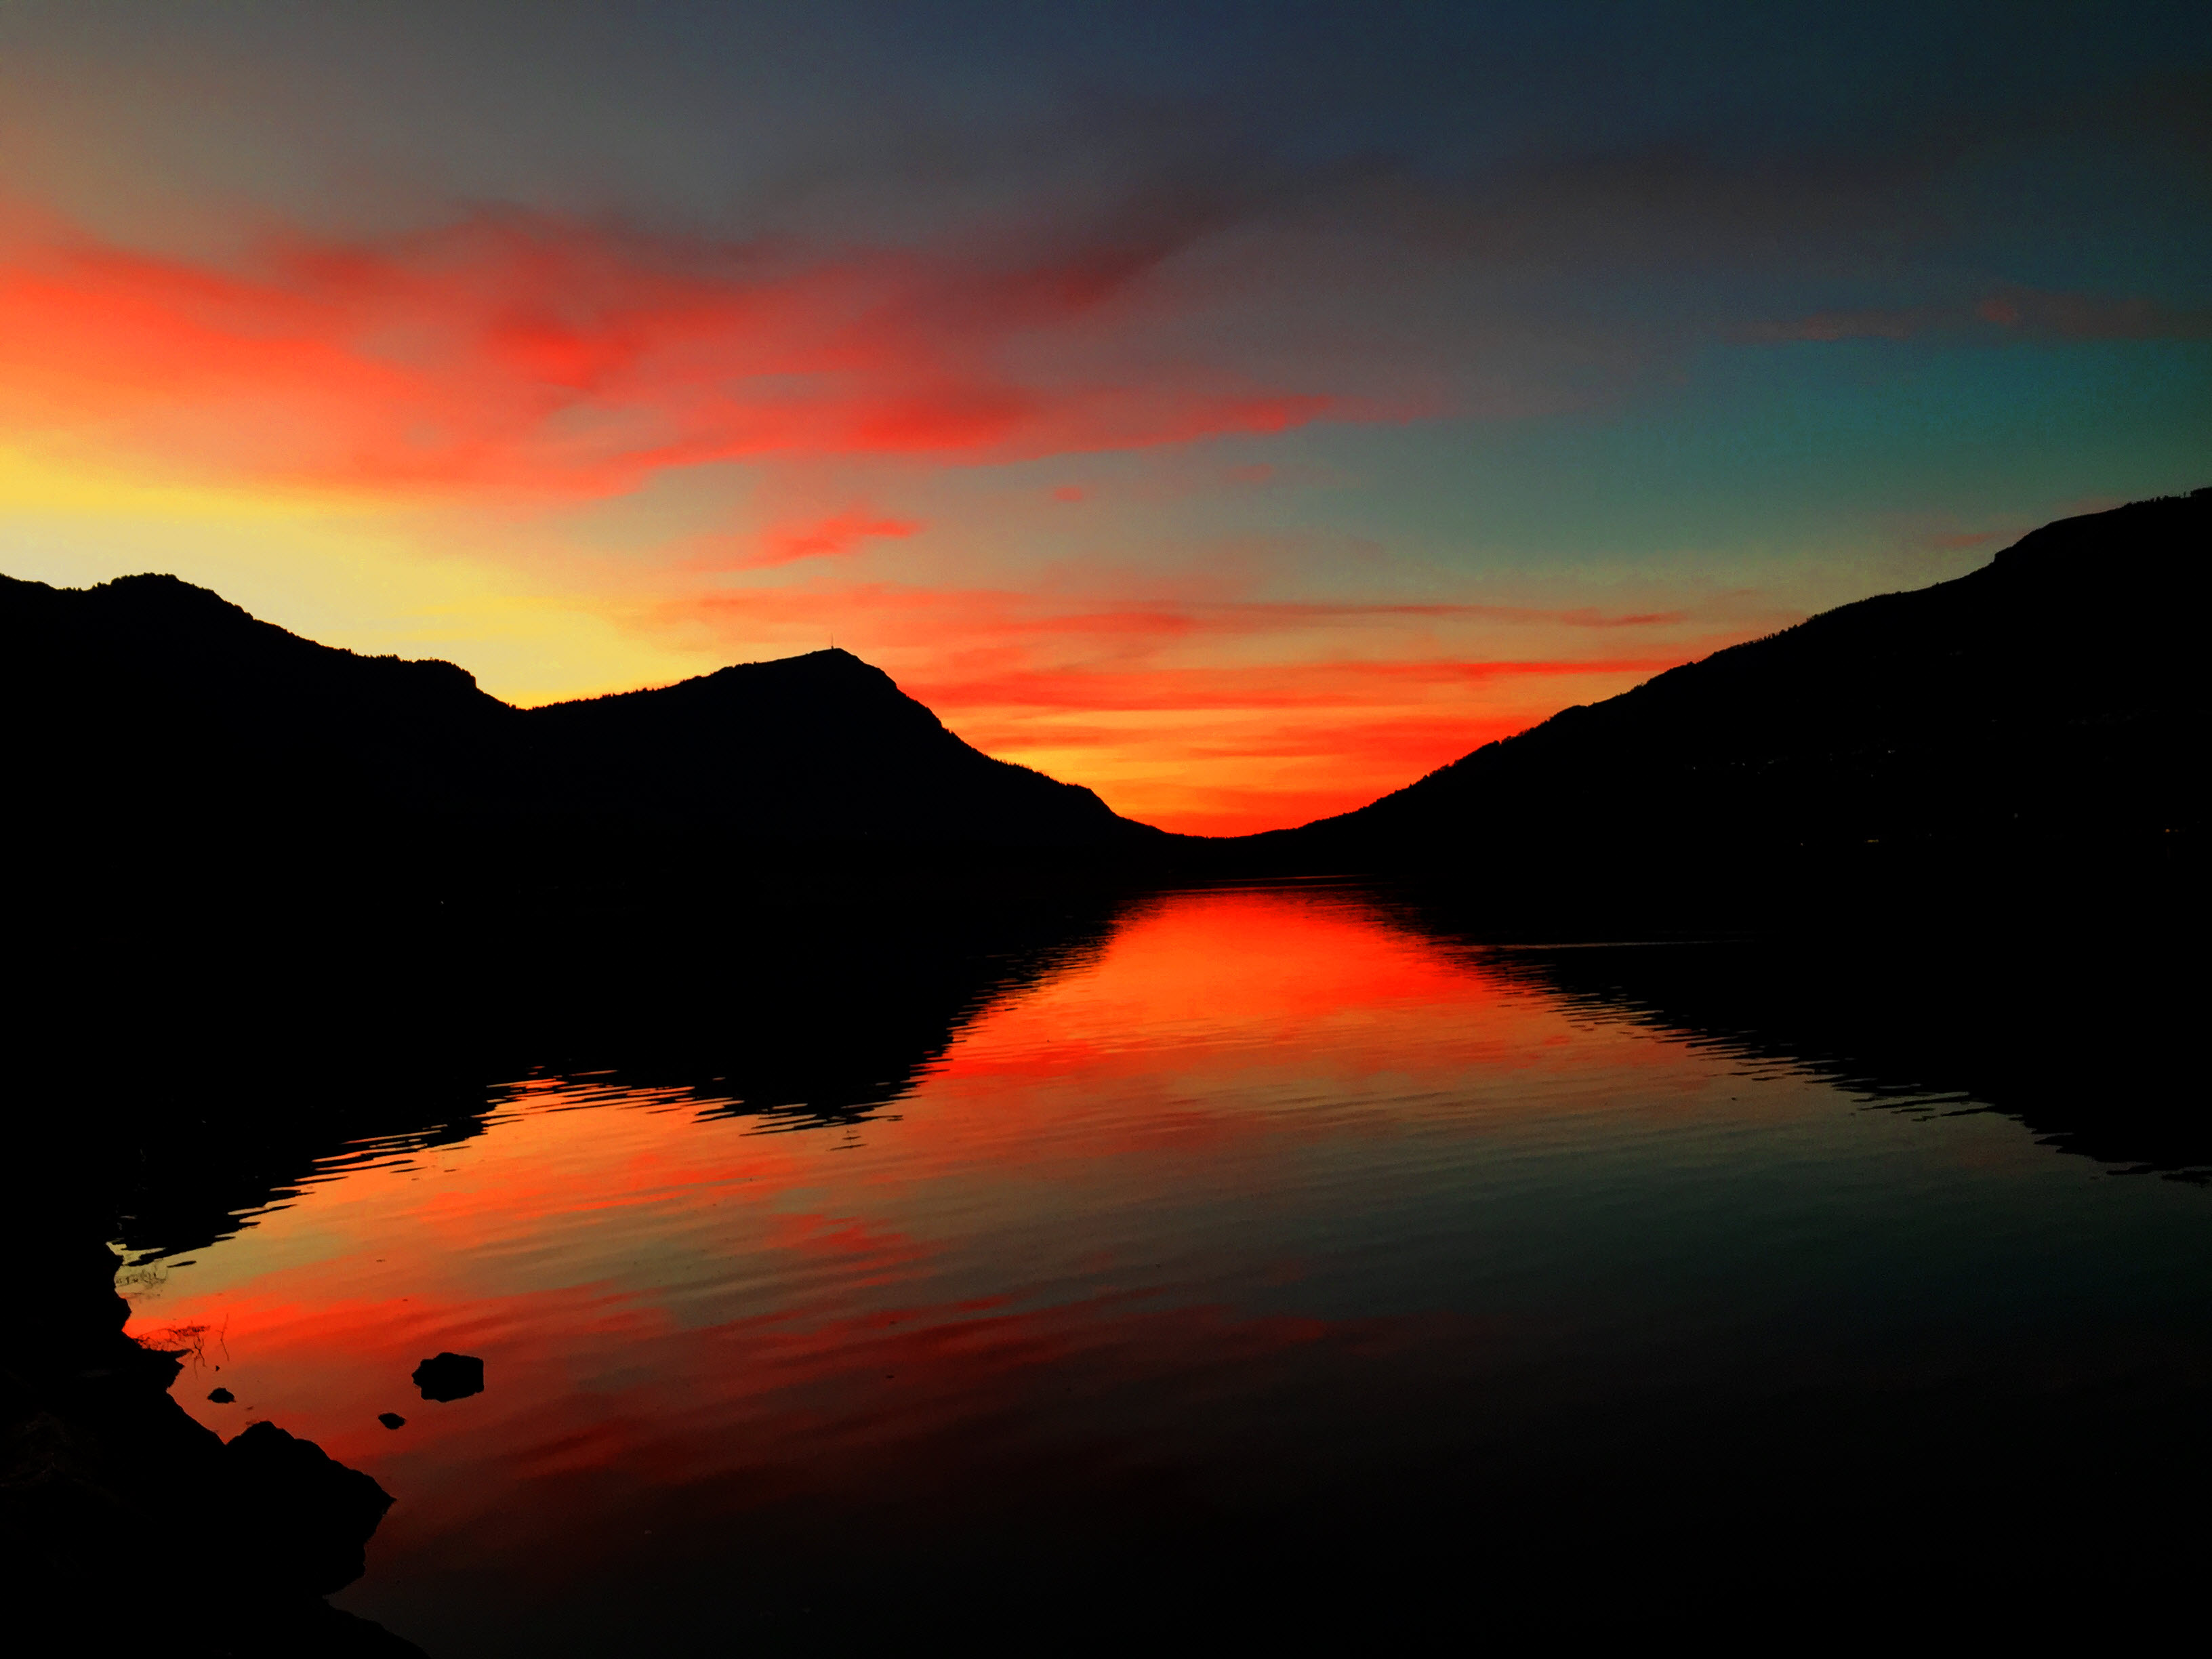 Red Sunset behind Rigi | MCU on Eclipse